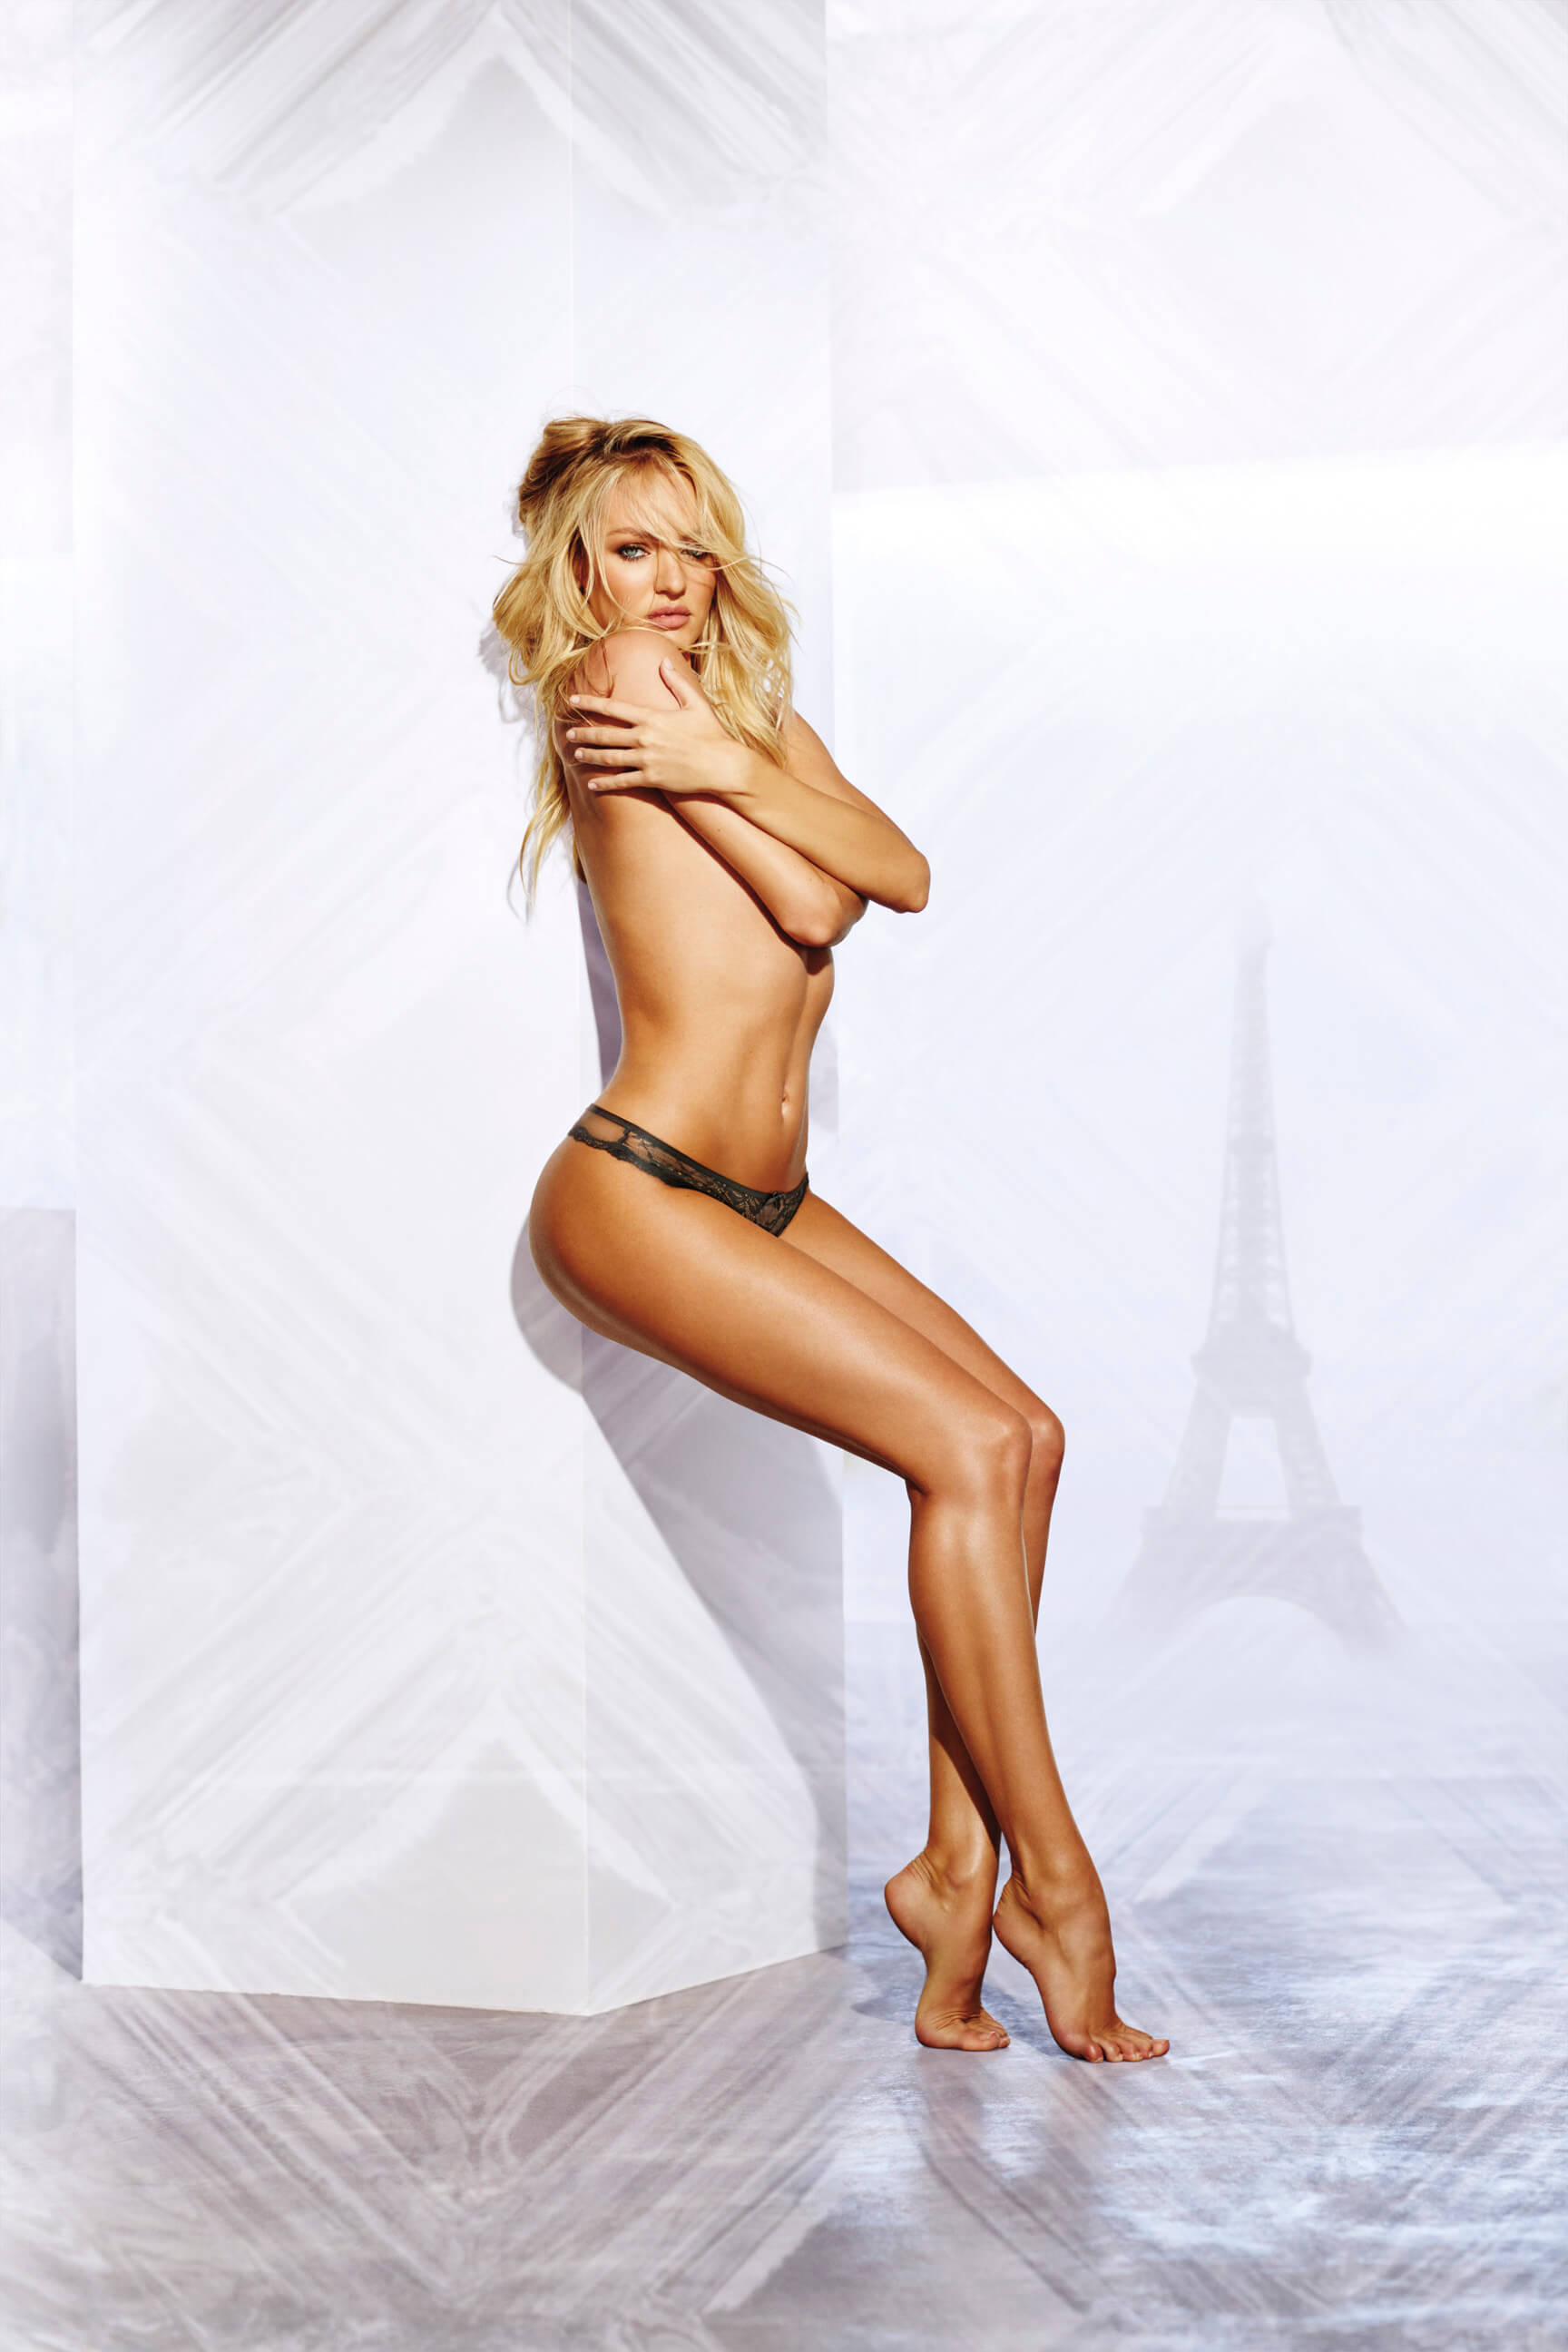 Candice Swanepoel hot nude pics